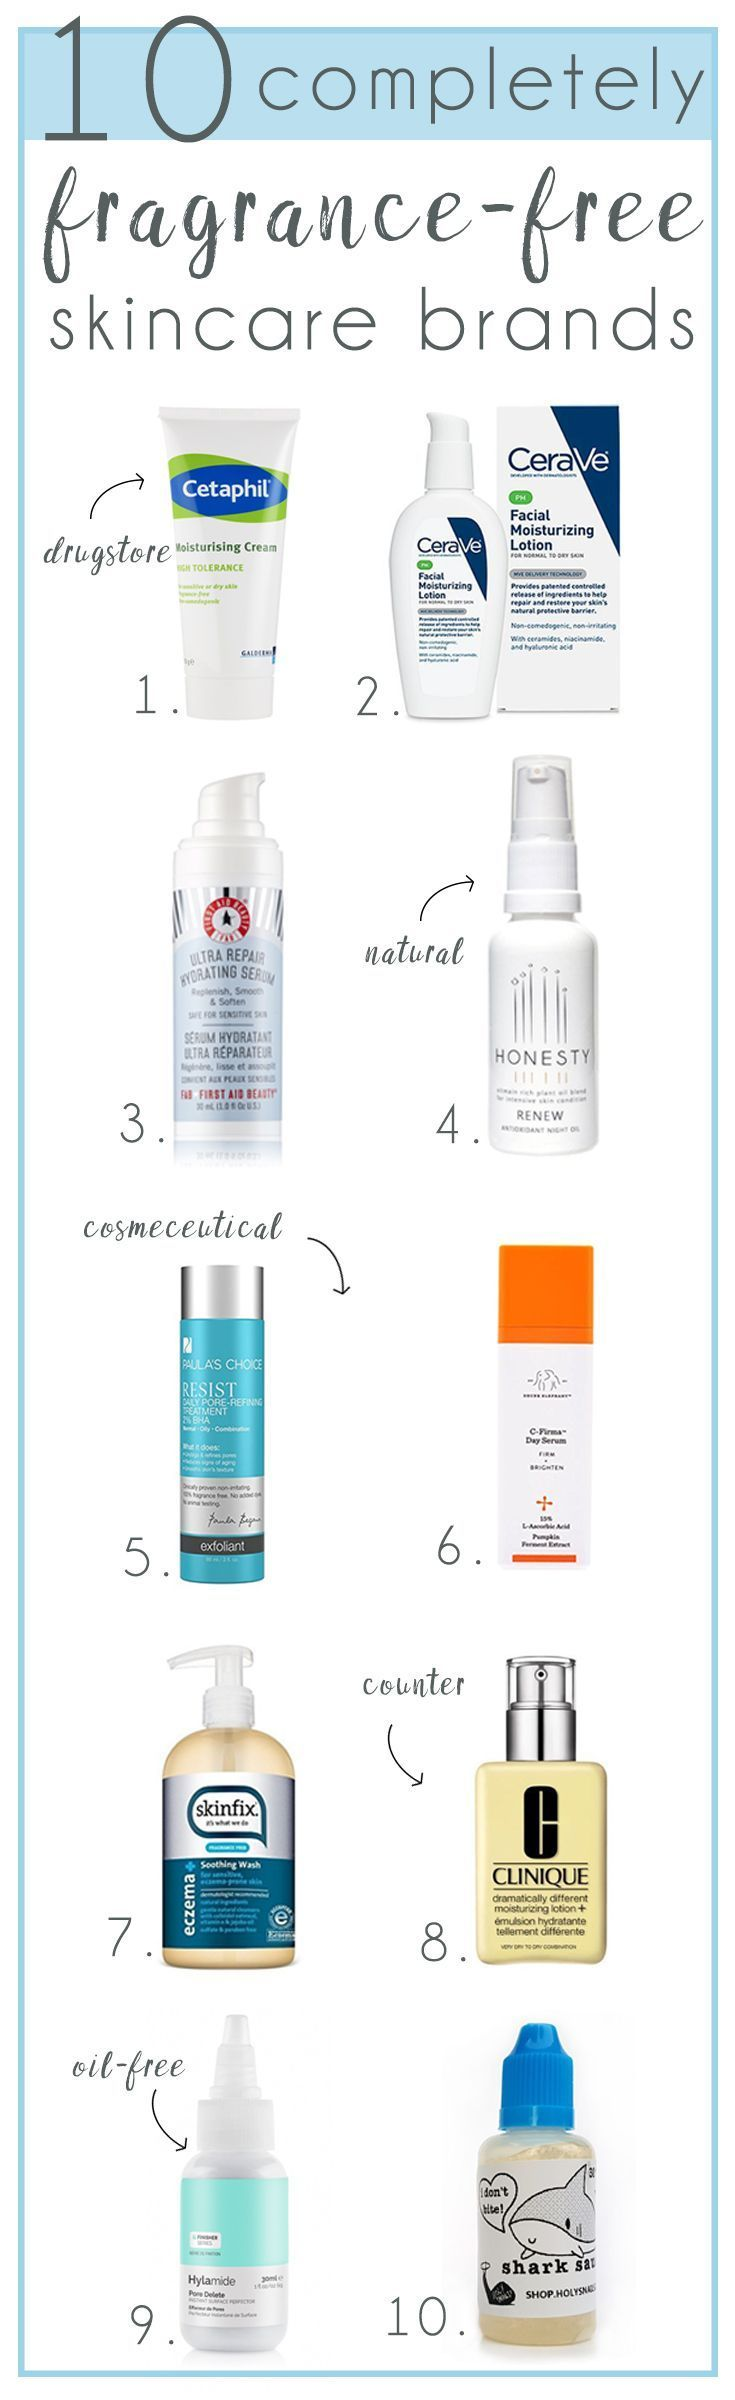 10 Completely Fragrance Free Skincare Brands for